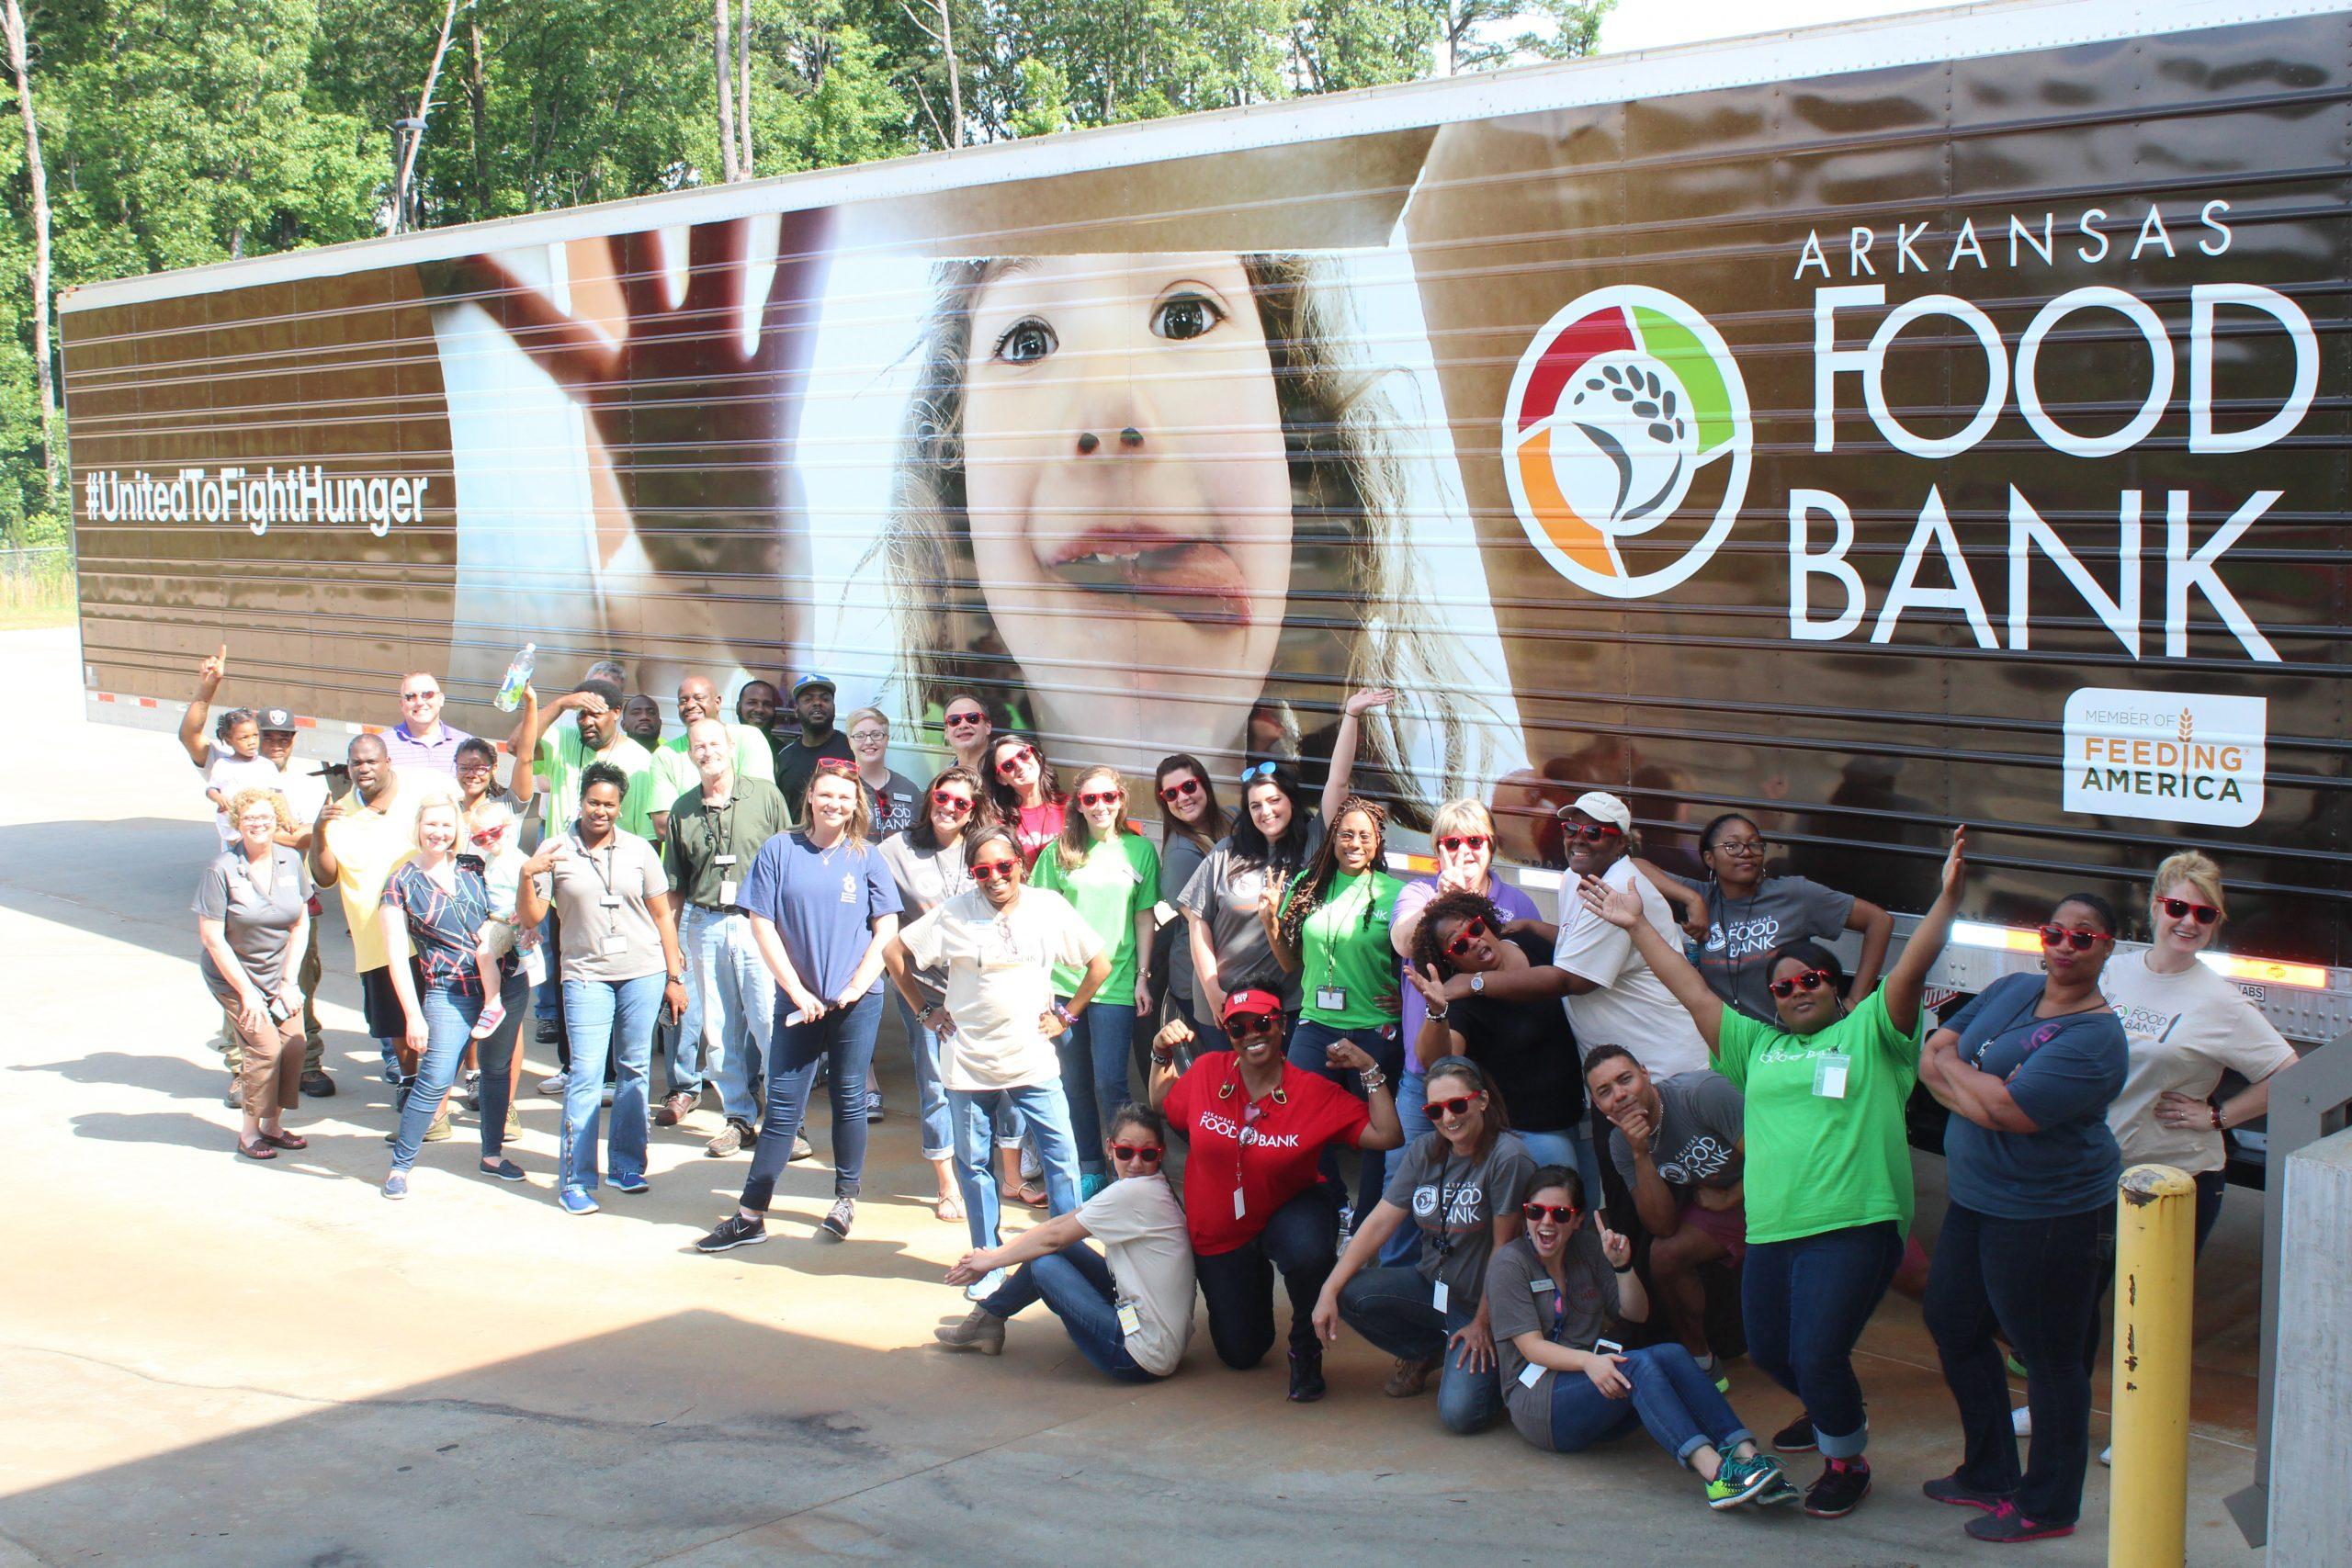 Food Bank of Arkansas: reducing food insecurity among children